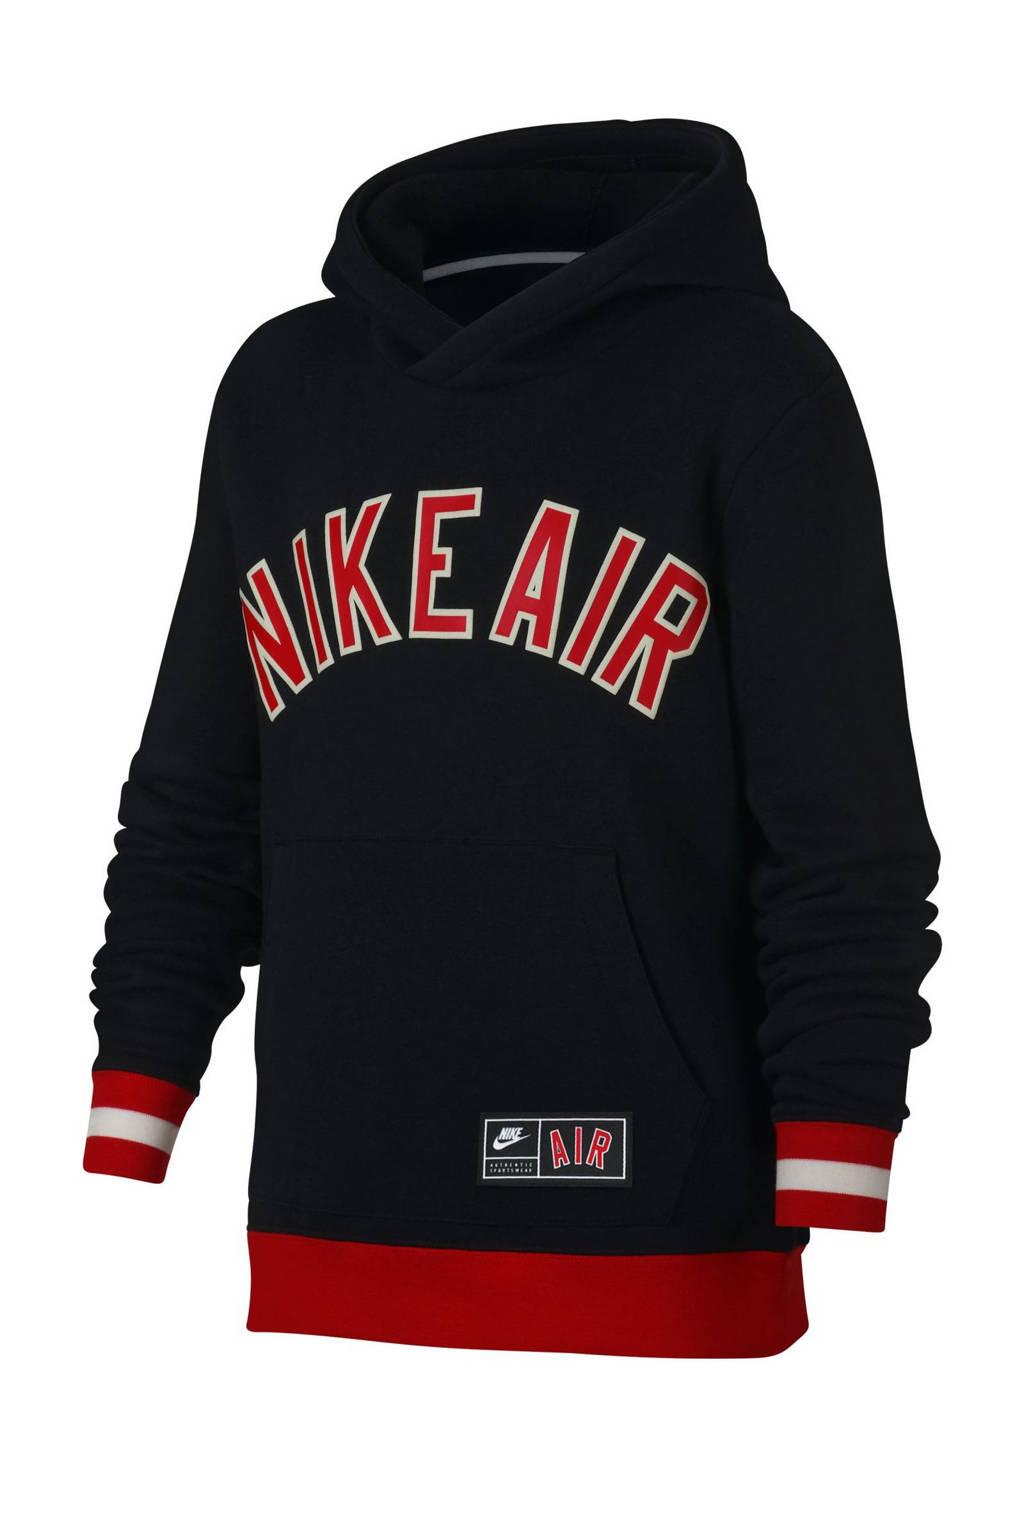 Nike   sportsweater met printopdruk zwart/rood, Zwart/rood